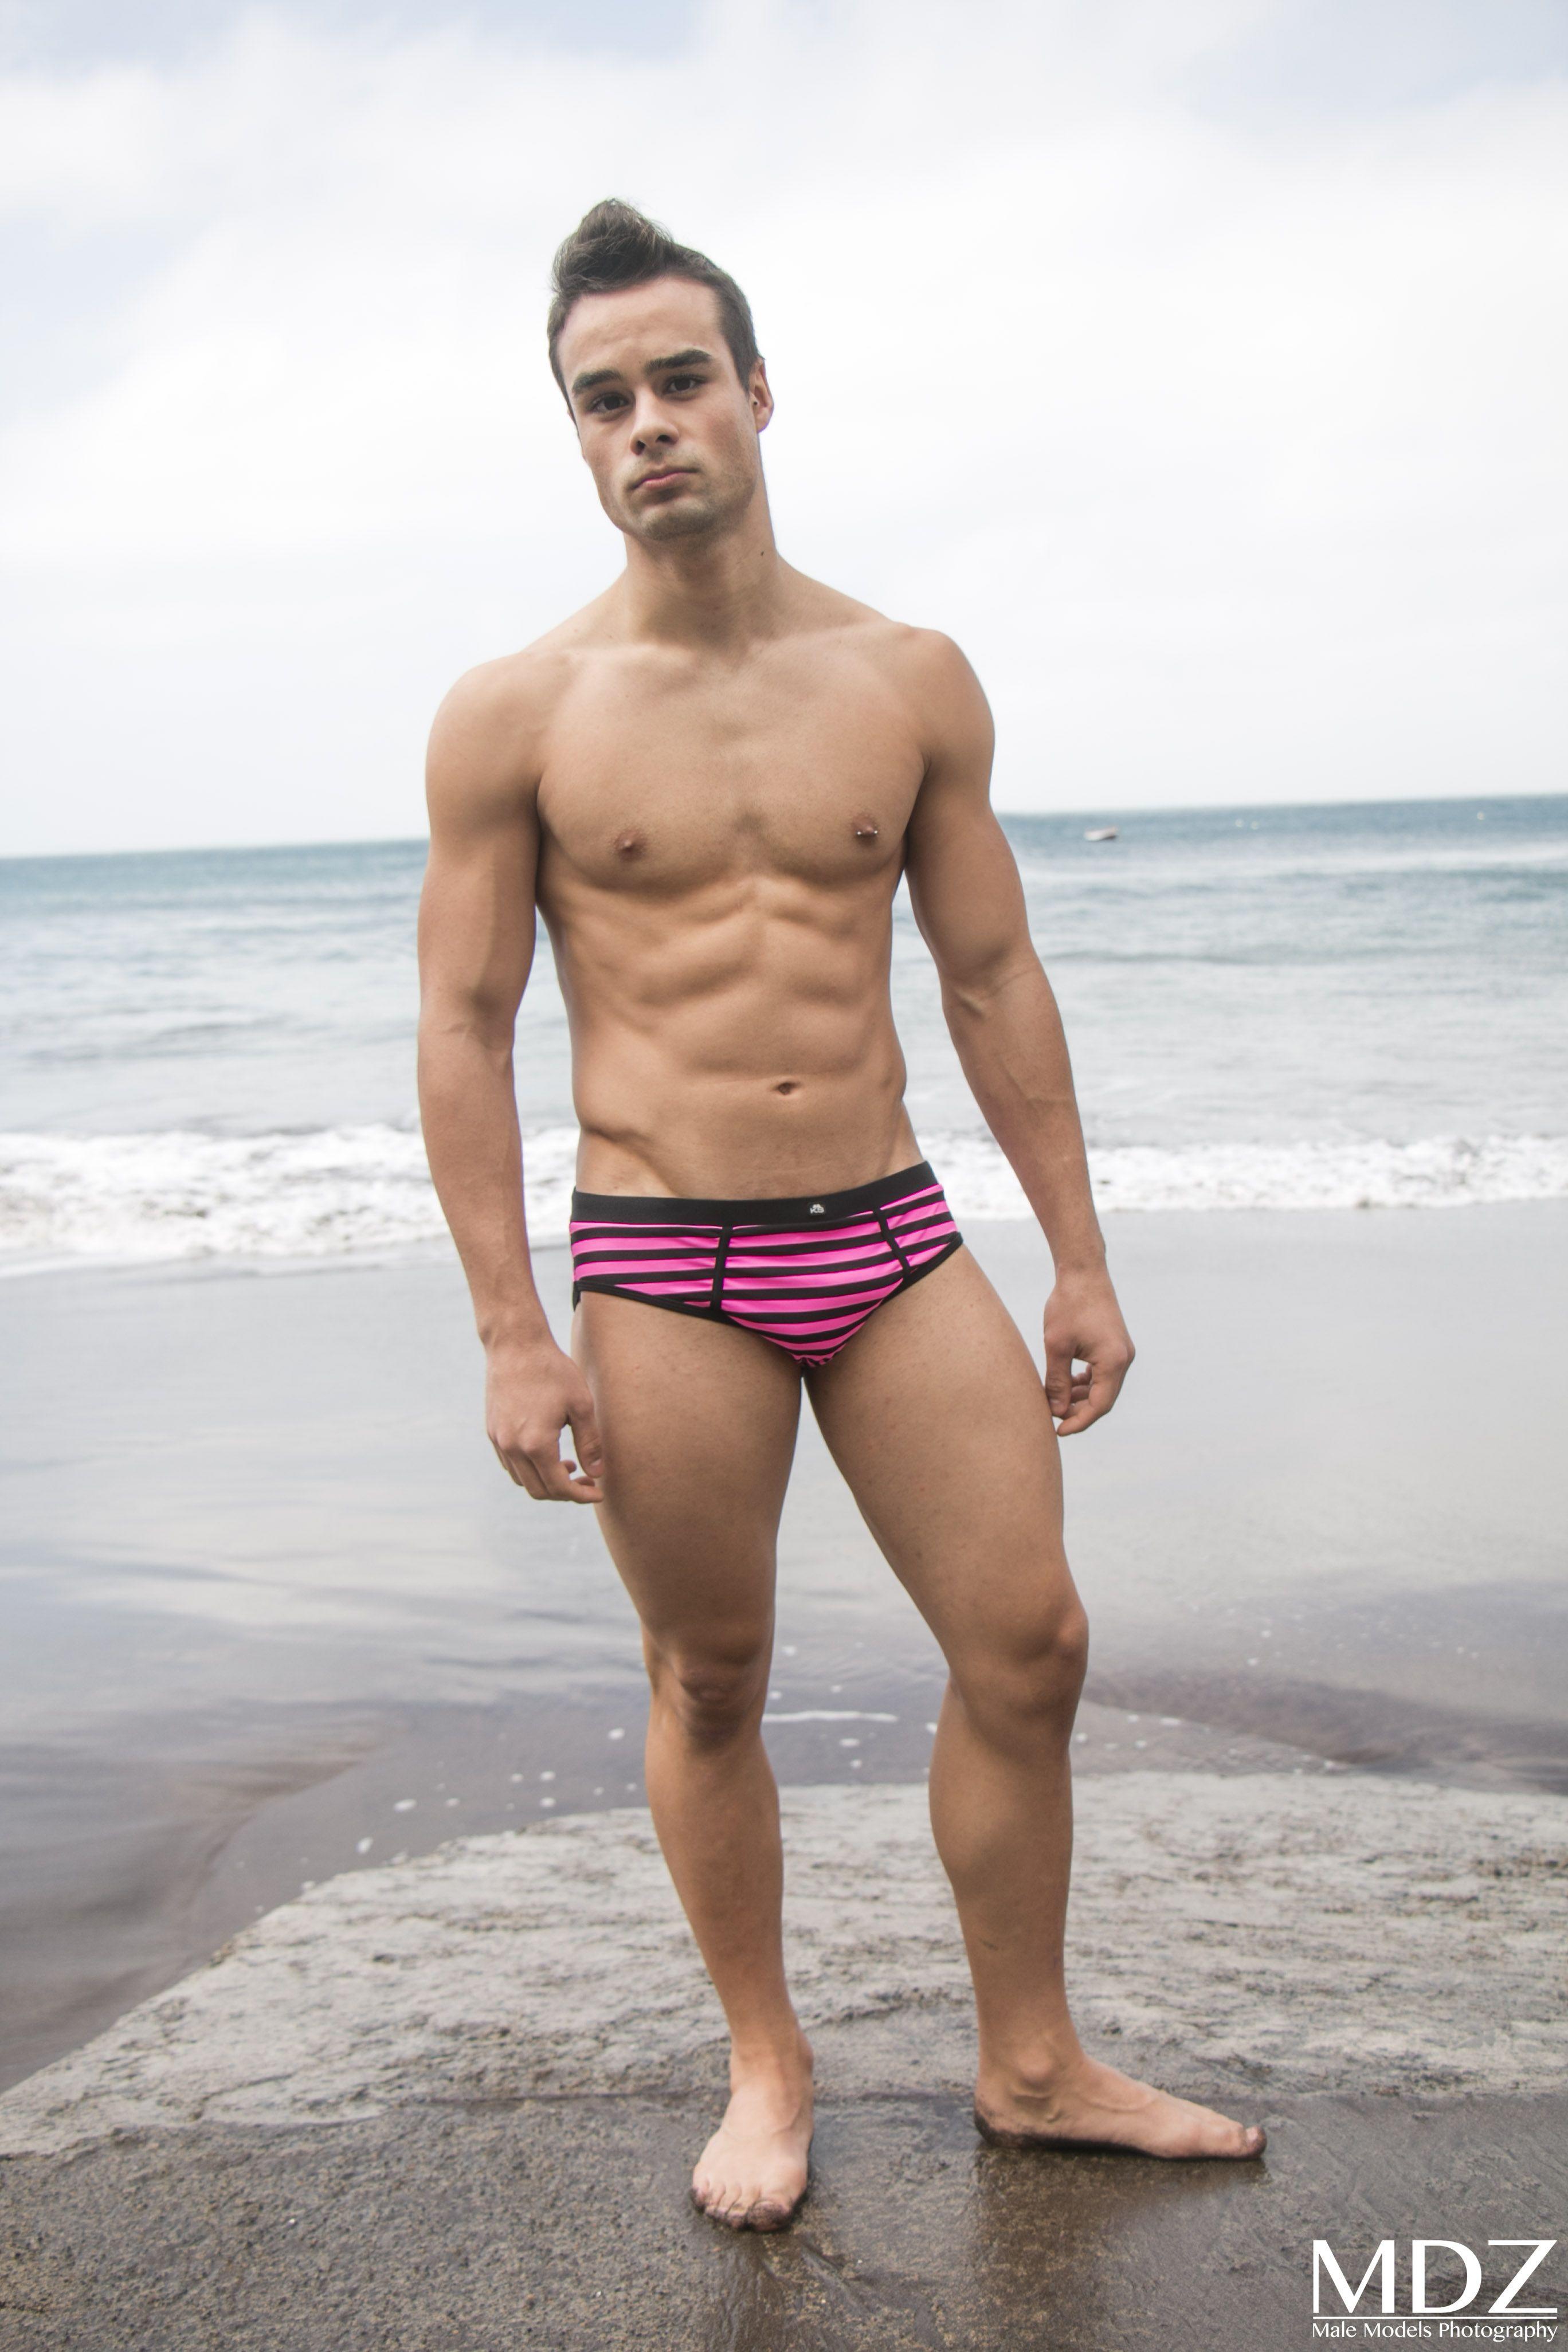 Underwear · Swimming · #male #model #MDZ #trunks #swimwear #beach #sand  #summer